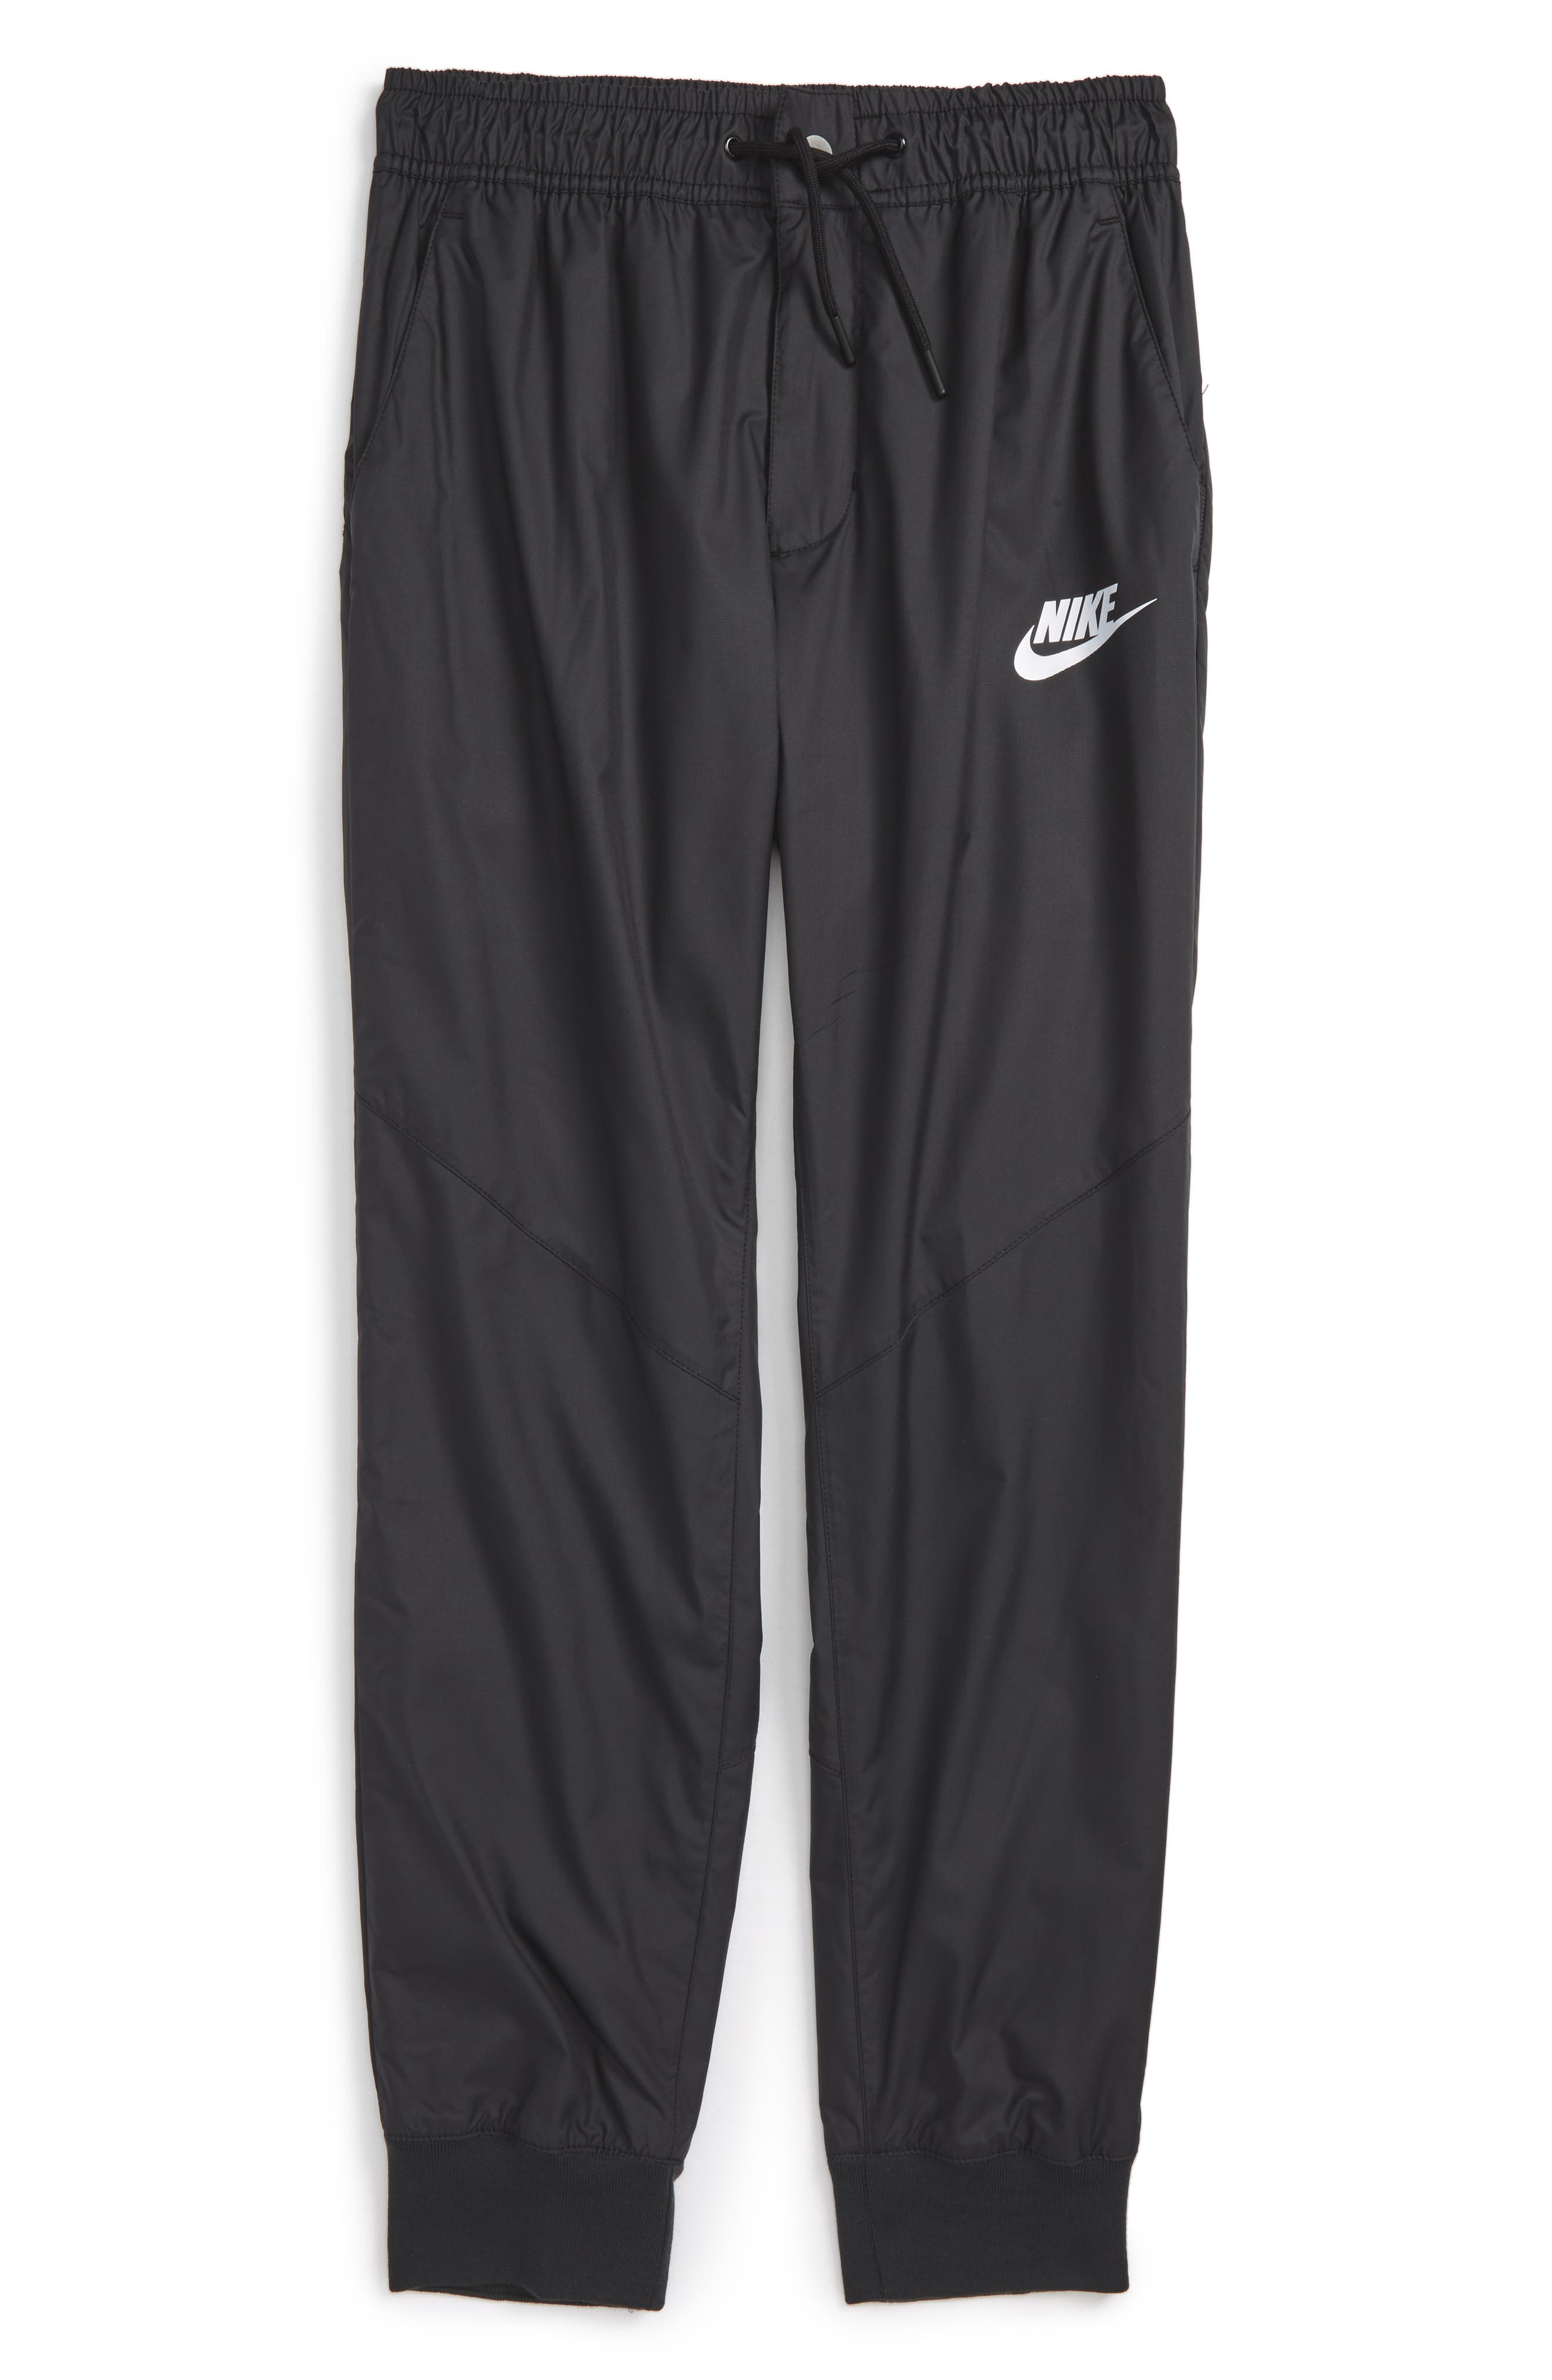 Sportswear Water Resistant Pants,                             Main thumbnail 1, color,                             010